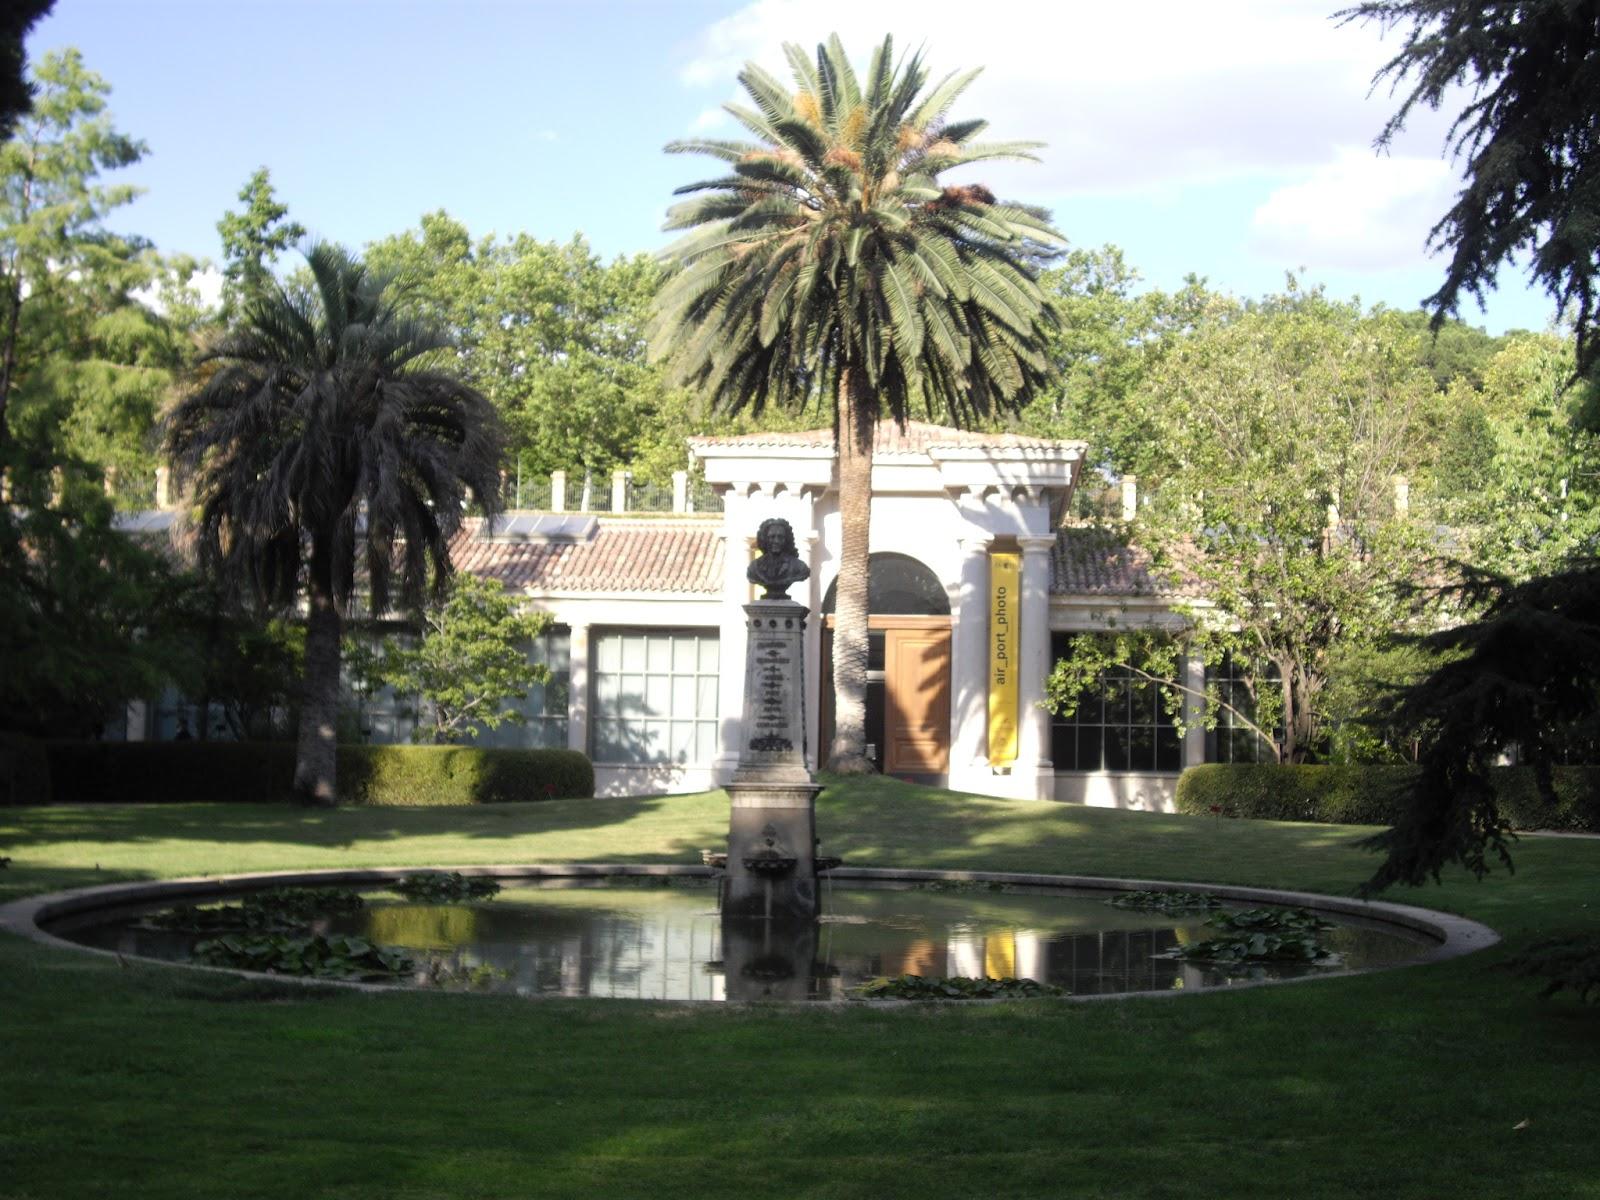 Figuras de jardin botanico imagui for Entrada jardin botanico madrid